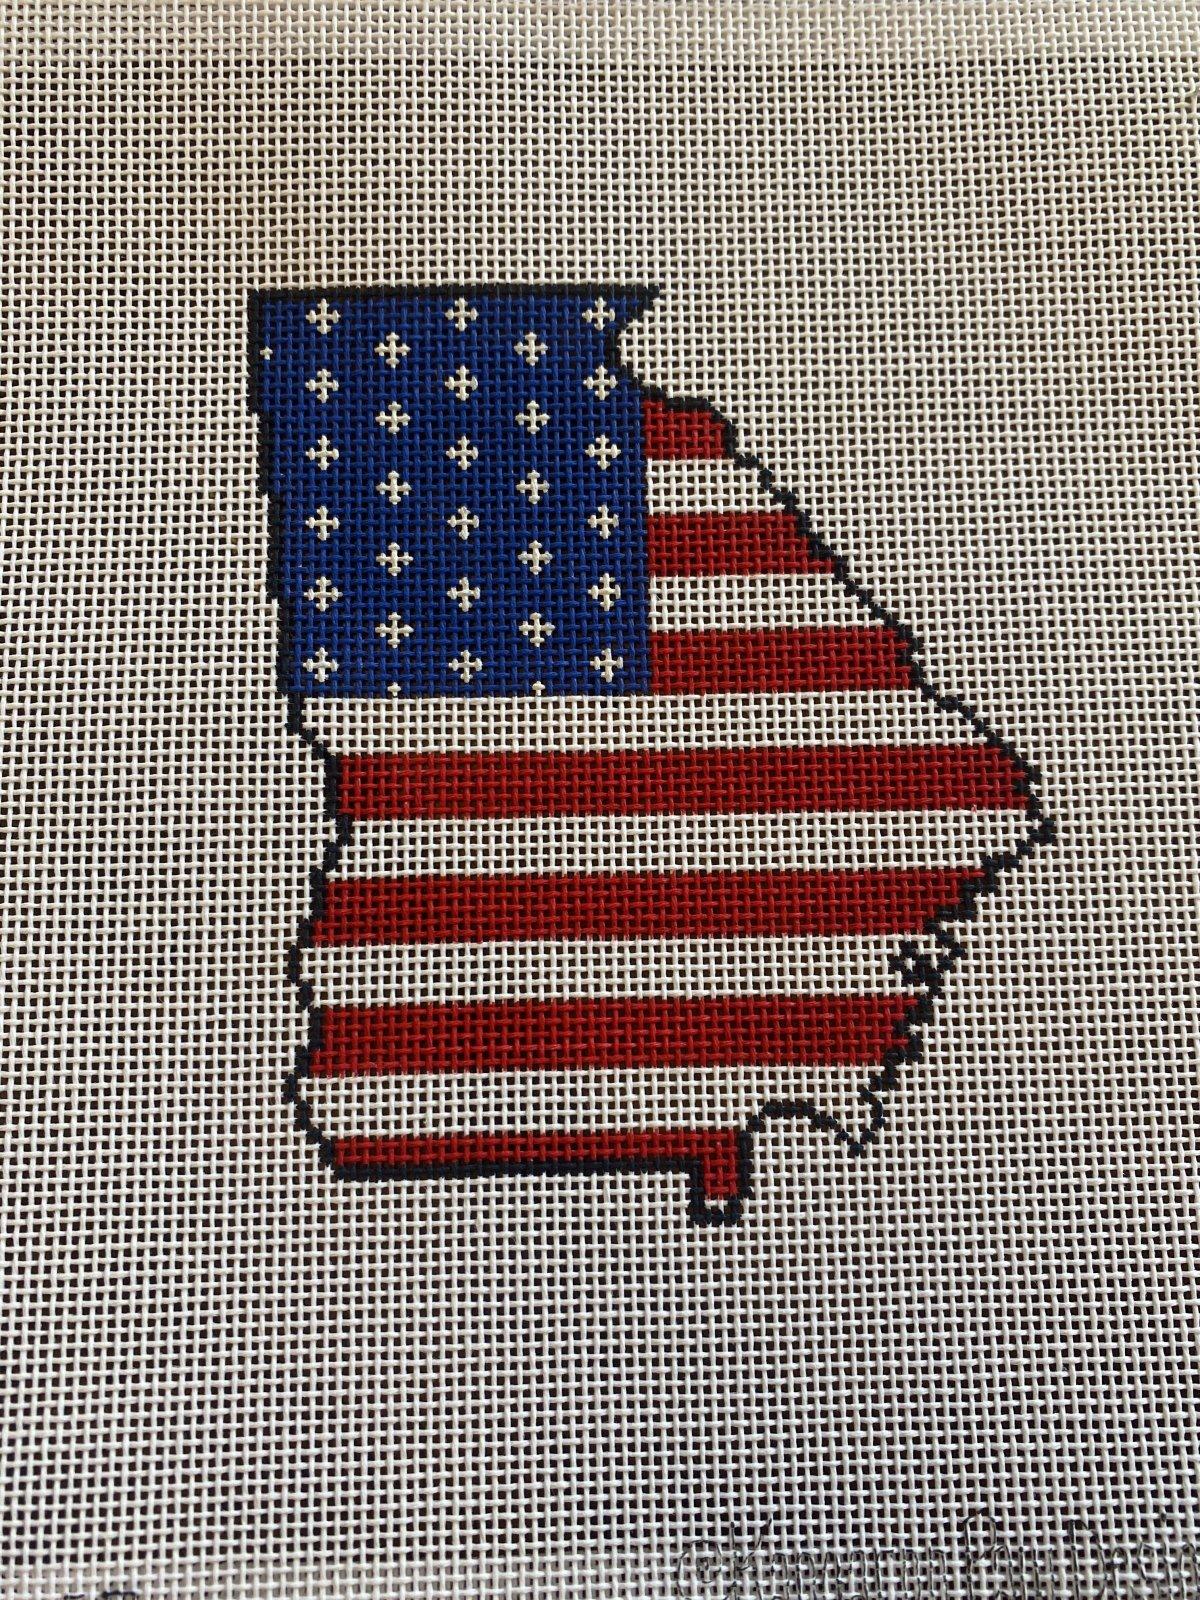 Georgia Outline Starts and Stripes